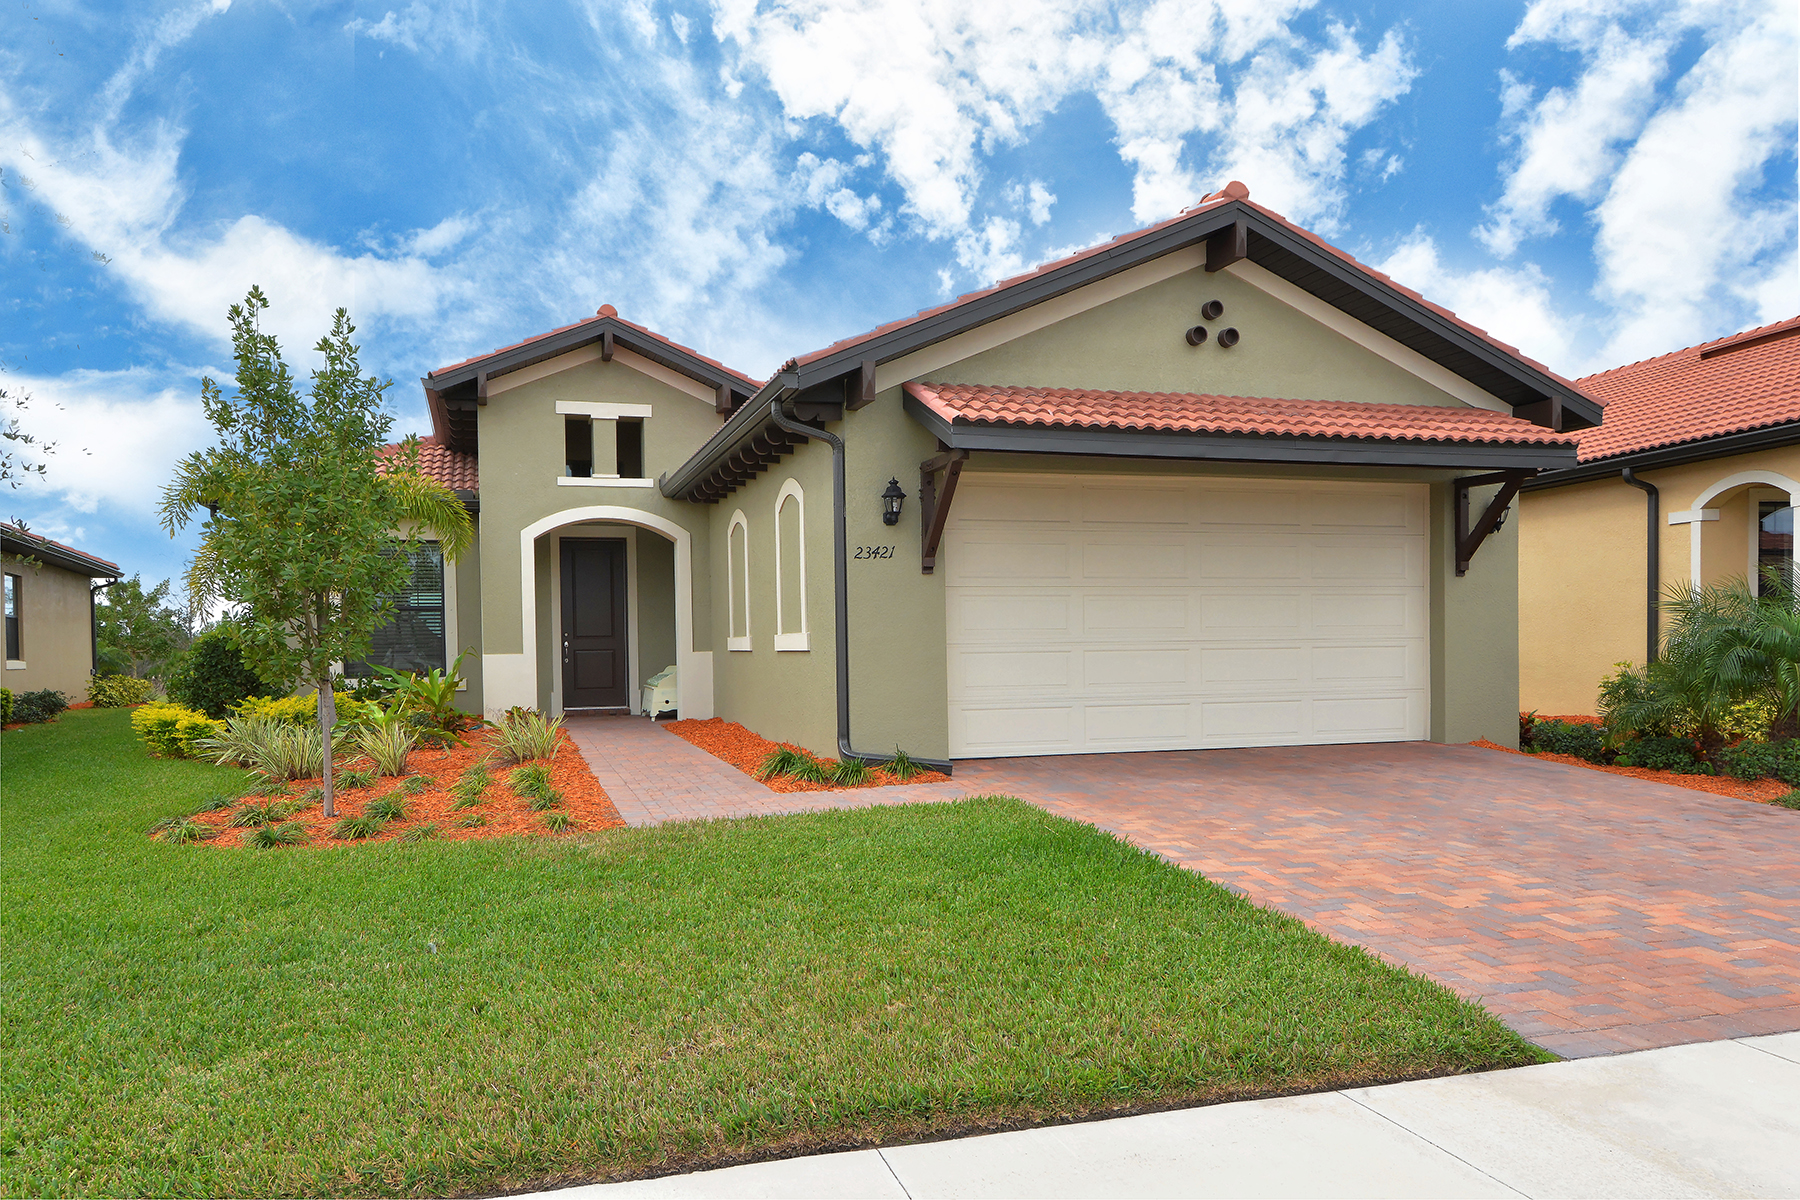 Single Family Home for Sale at SARASOTA NATIONAL 23421 Copperleaf Dr Venice, Florida, 34293 United States